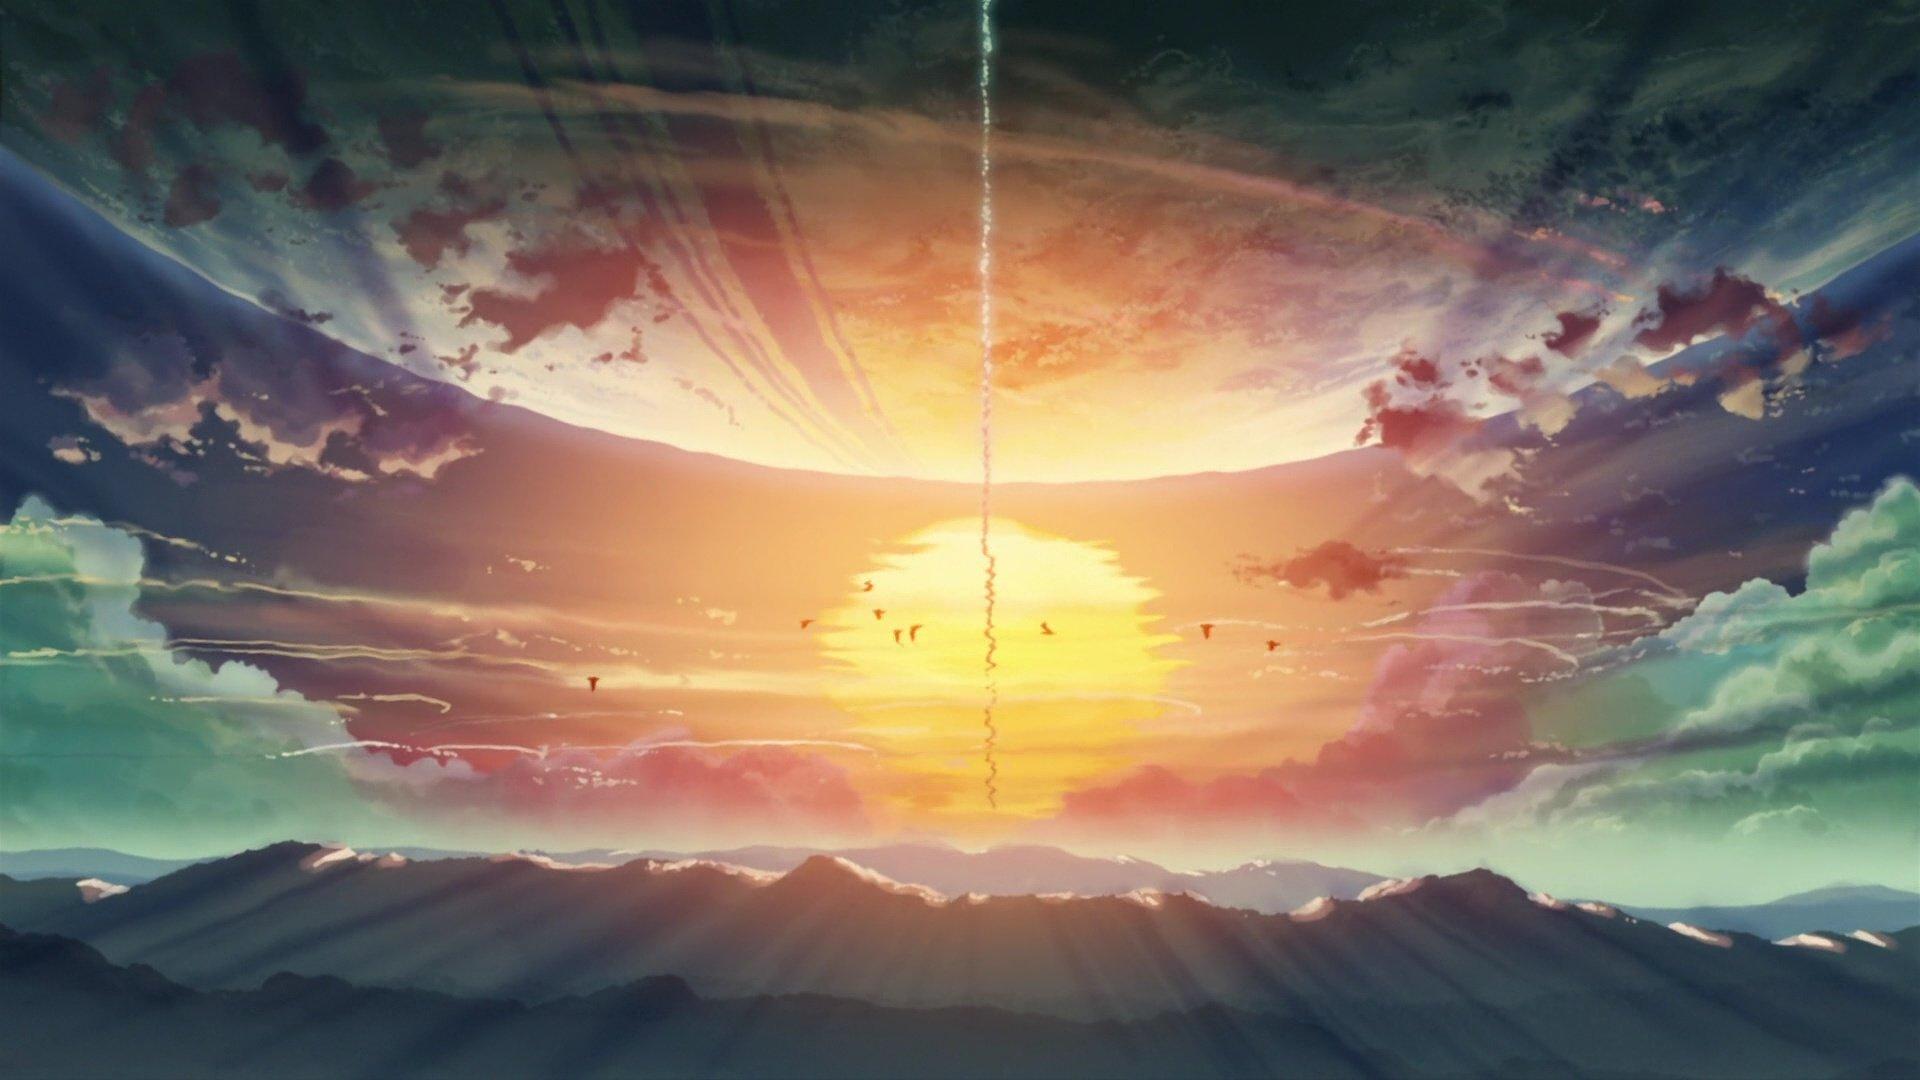 Scenery Anime Wallpapers 1920x1080 Full Hd 1080p Desktop Backgrounds